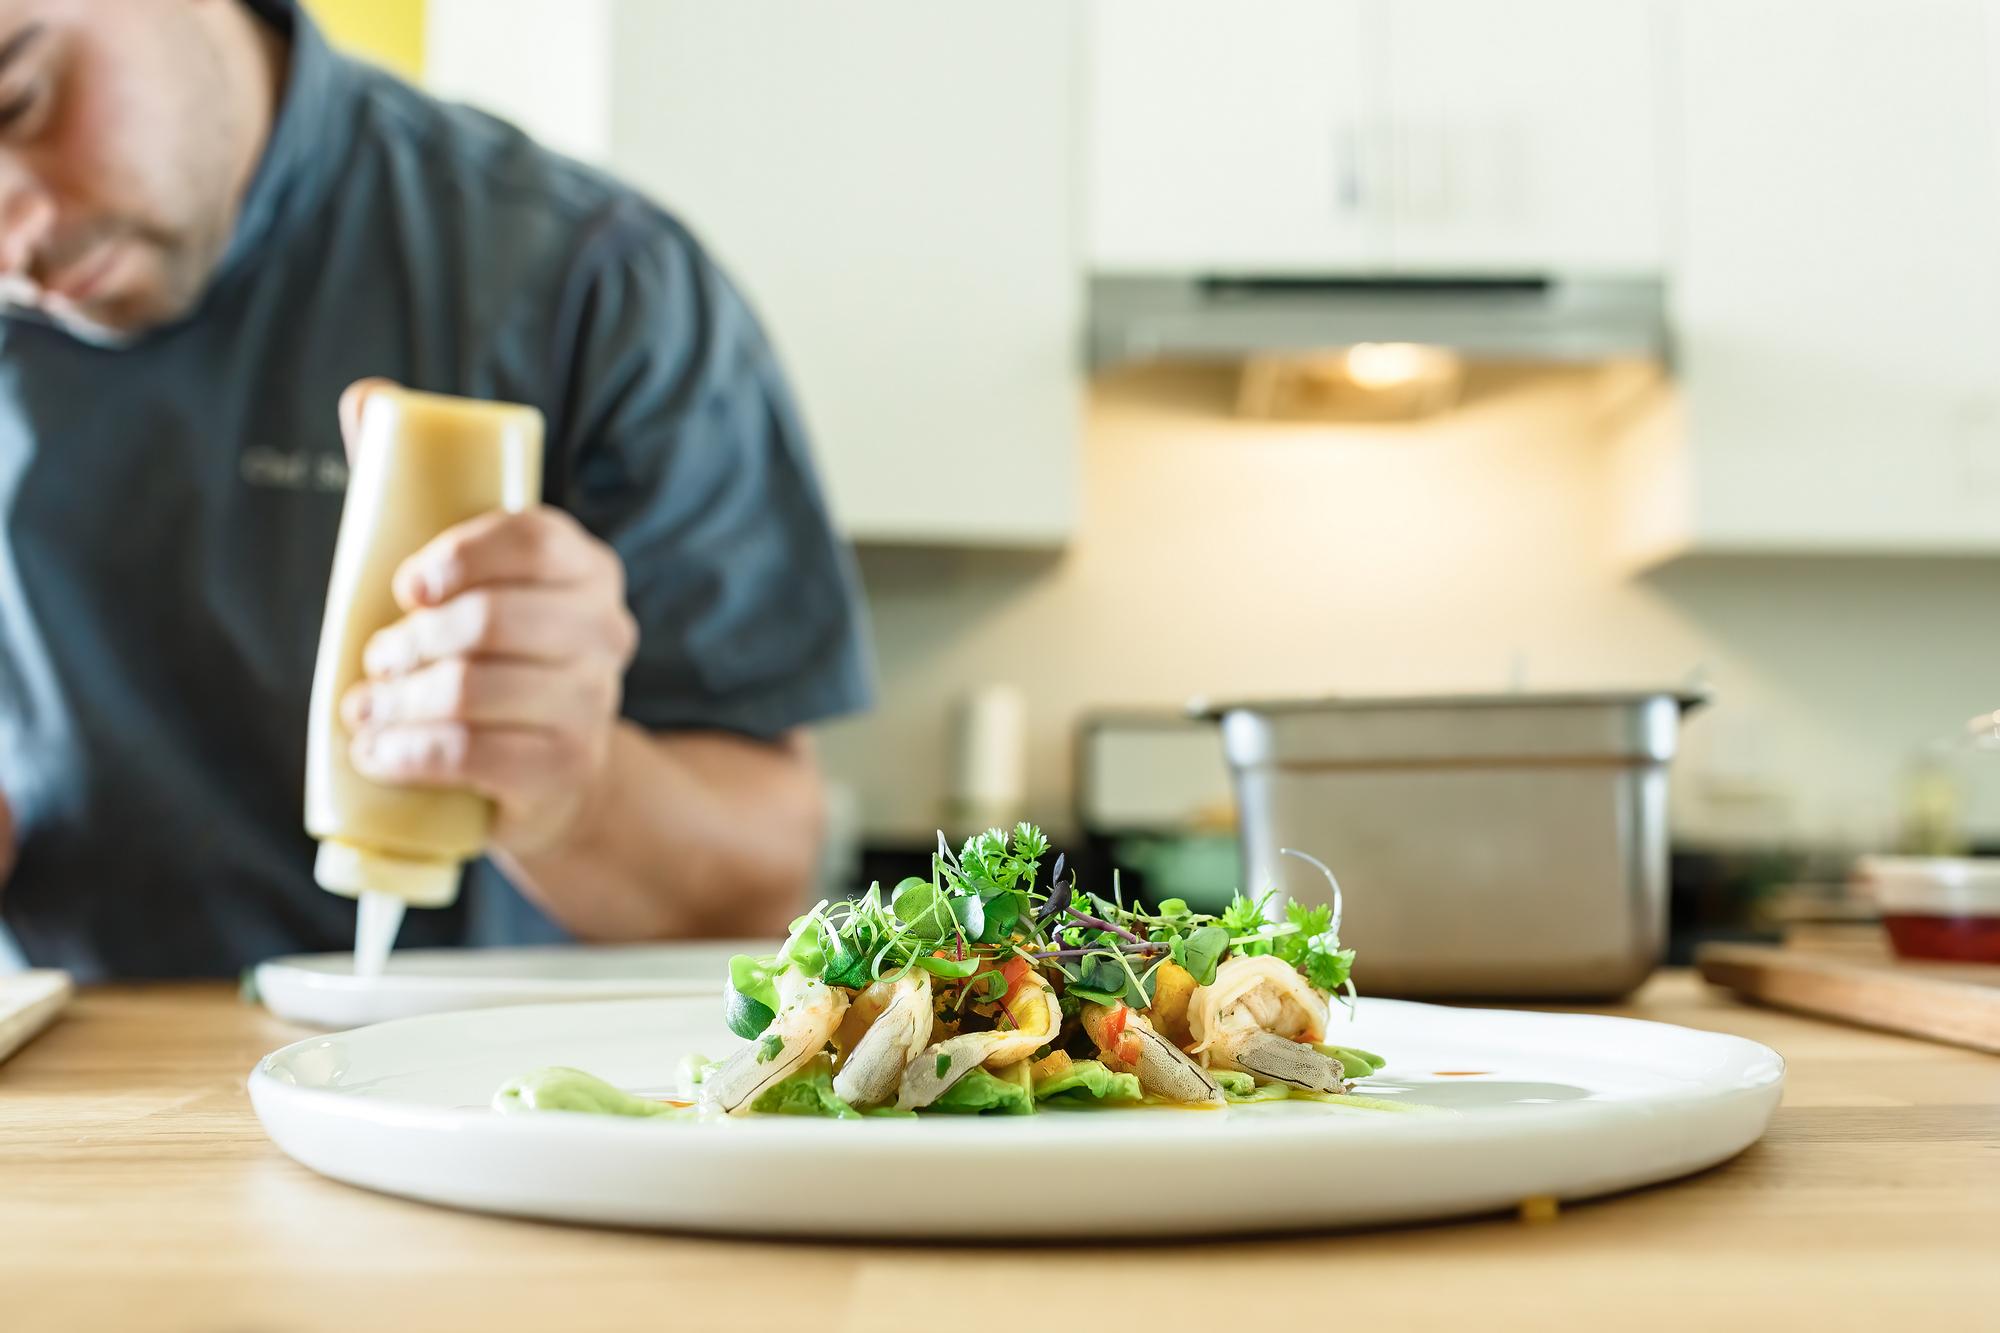 Preparing Sushi plate